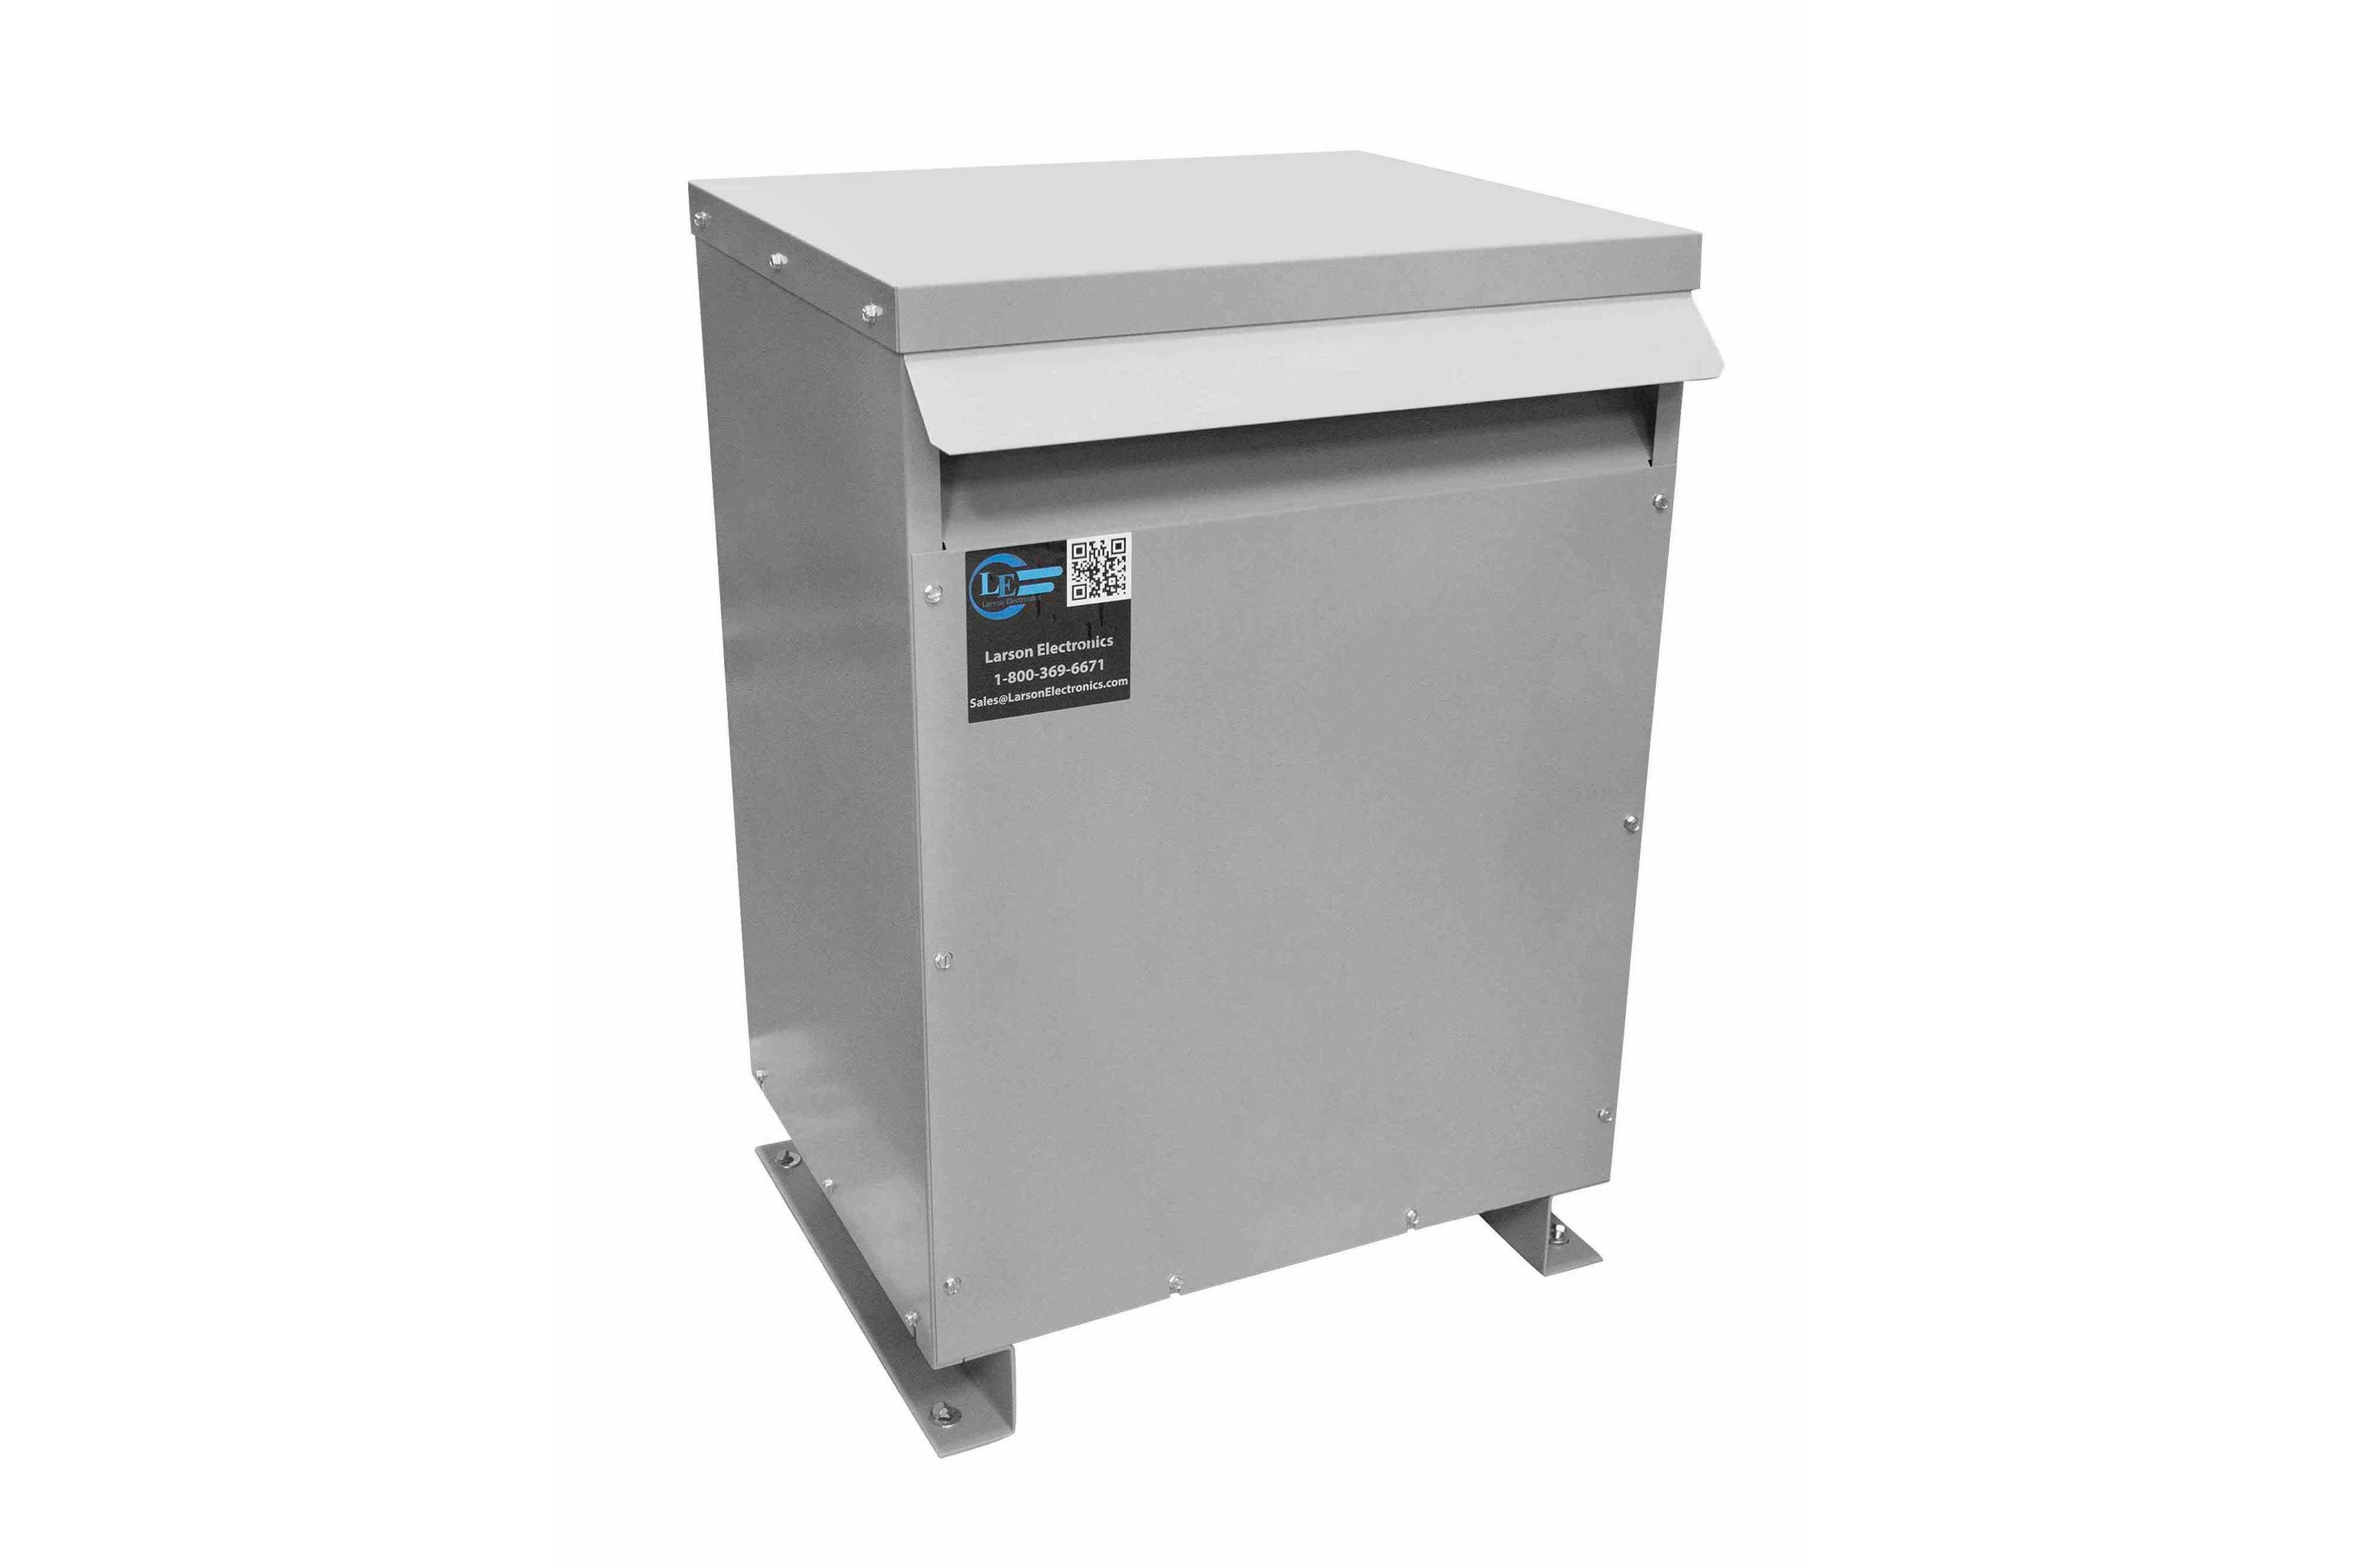 400 kVA 3PH DOE Transformer, 208V Delta Primary, 480Y/277 Wye-N Secondary, N3R, Ventilated, 60 Hz